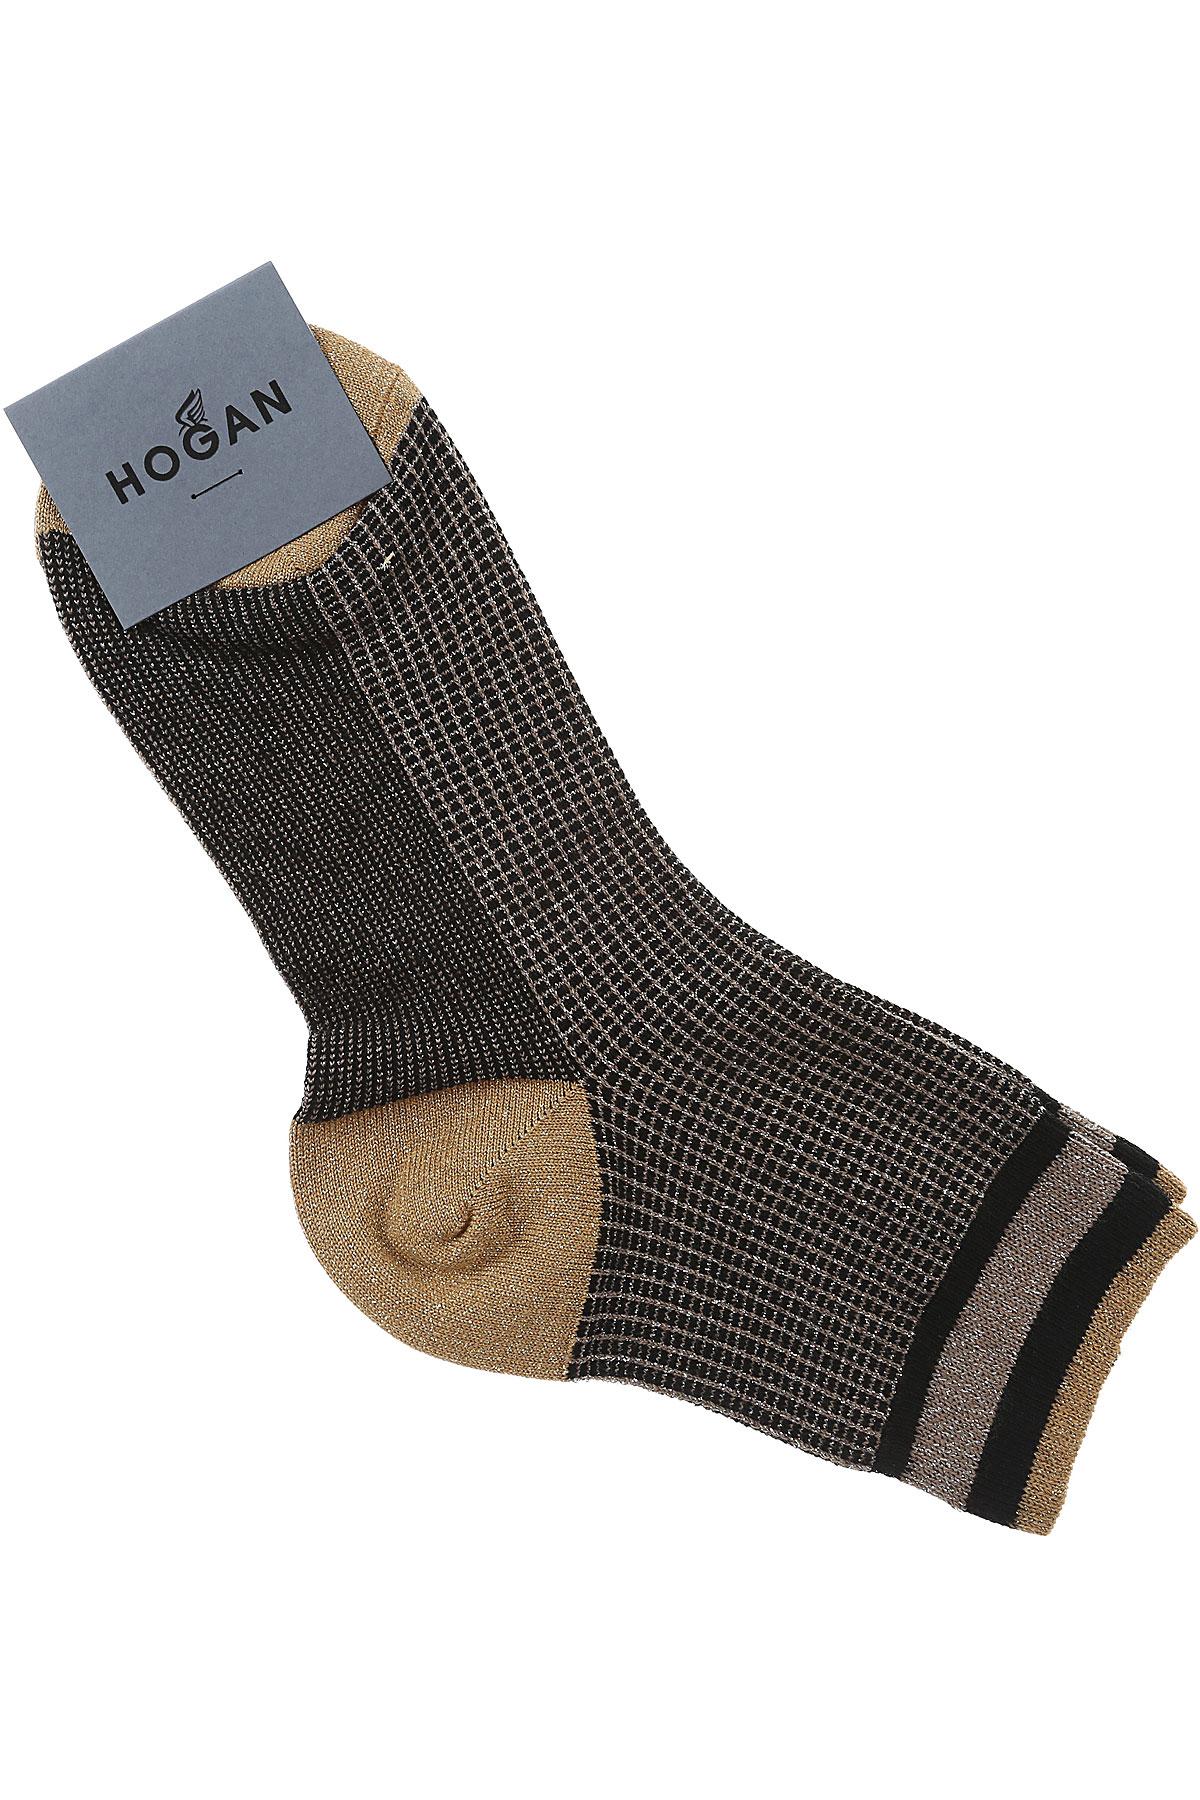 Image of Hogan Socks, Black, Cotton, 2017